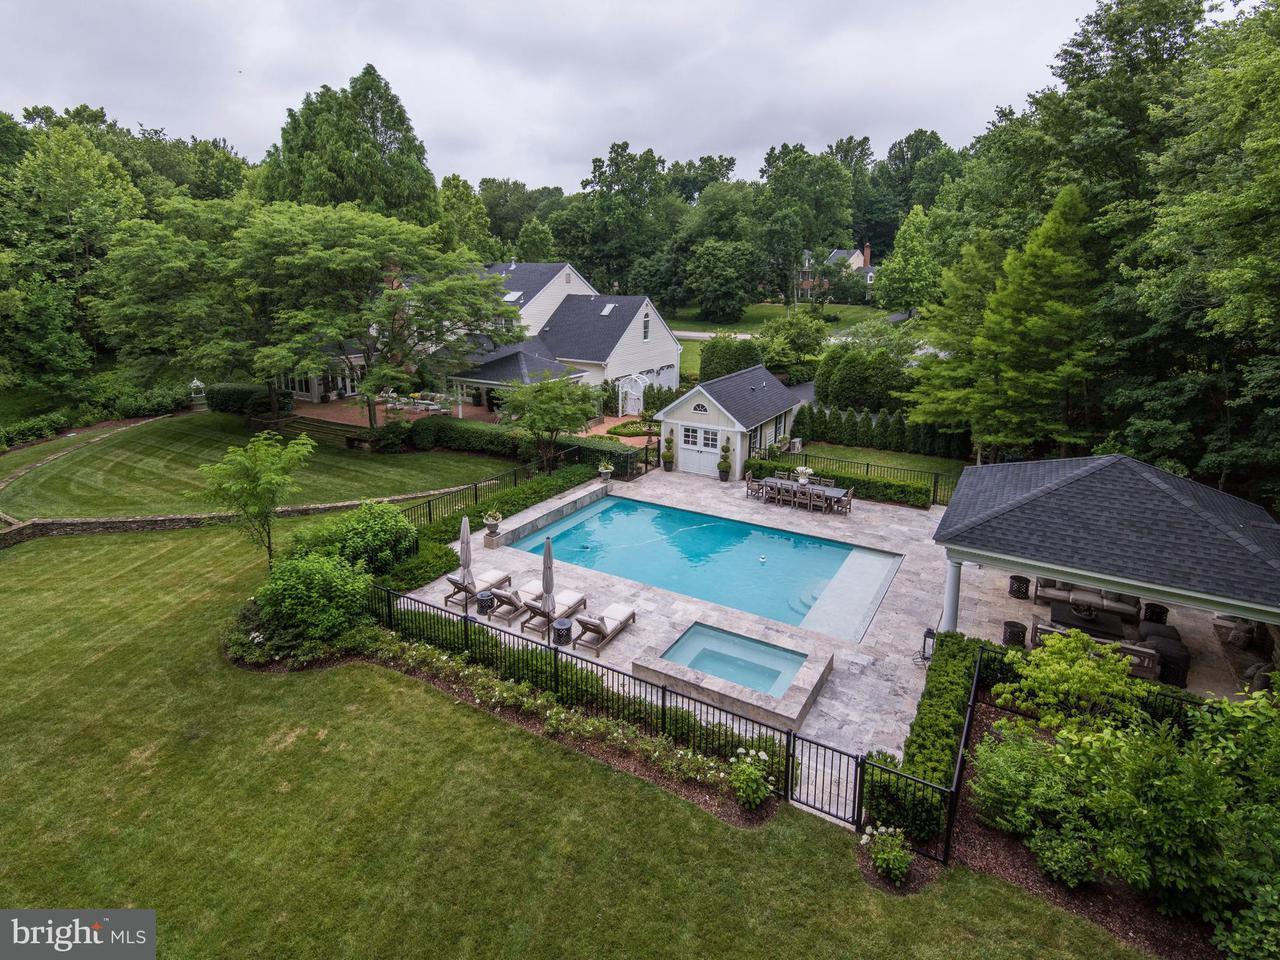 獨棟家庭住宅 為 出售 在 6195 Freds Oak Road 6195 Freds Oak Road Fairfax Station, 弗吉尼亞州 22039 美國